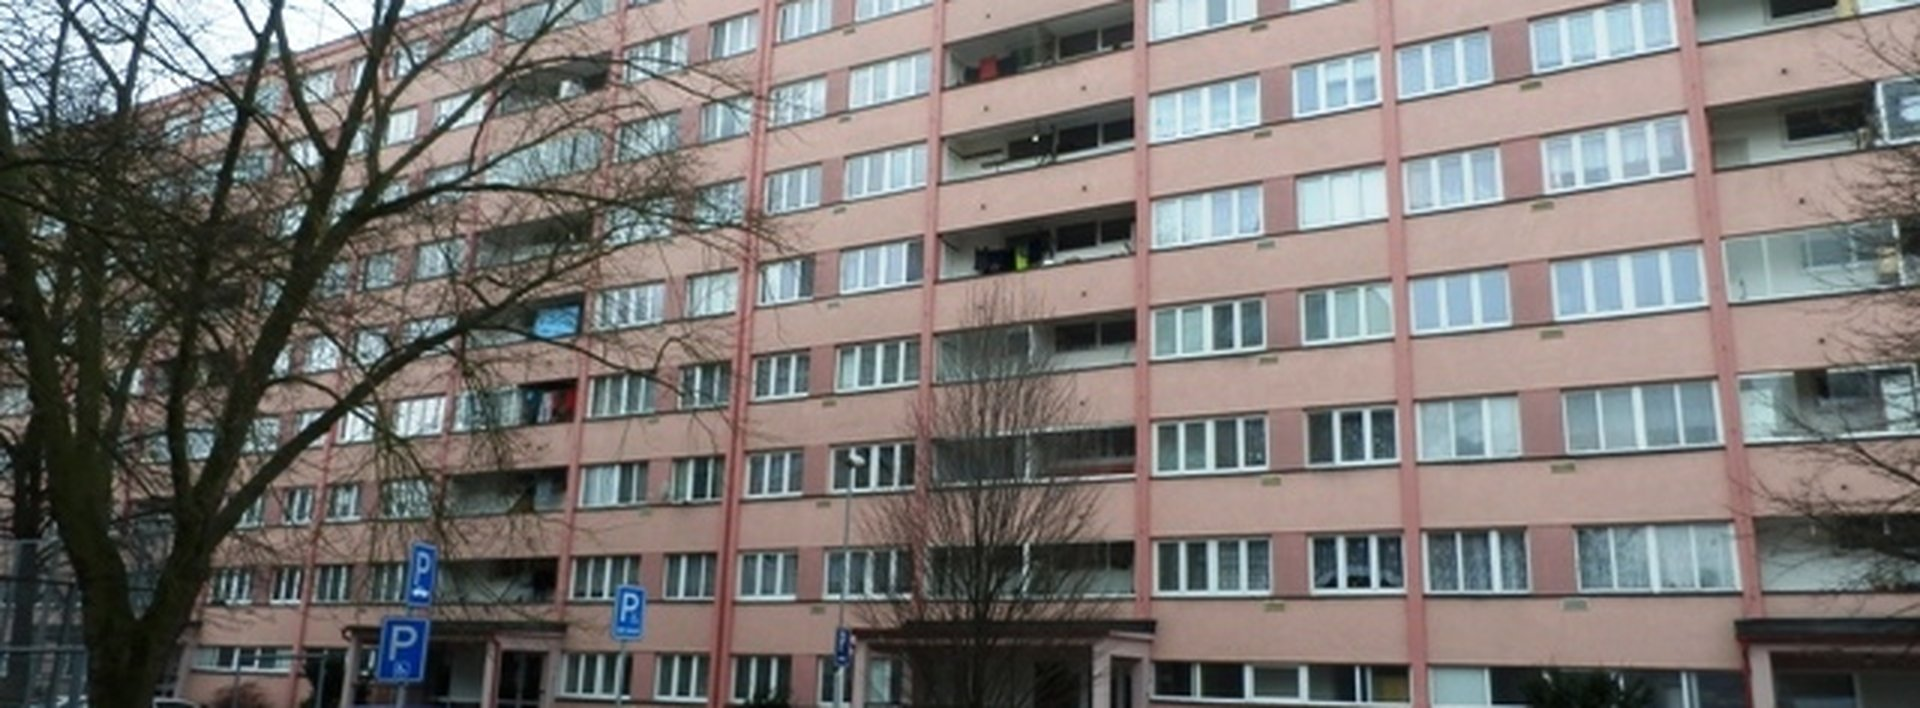 Byt 1+kk v centru Polabin (Pardubice), 28 m², Ev.č.: N47071